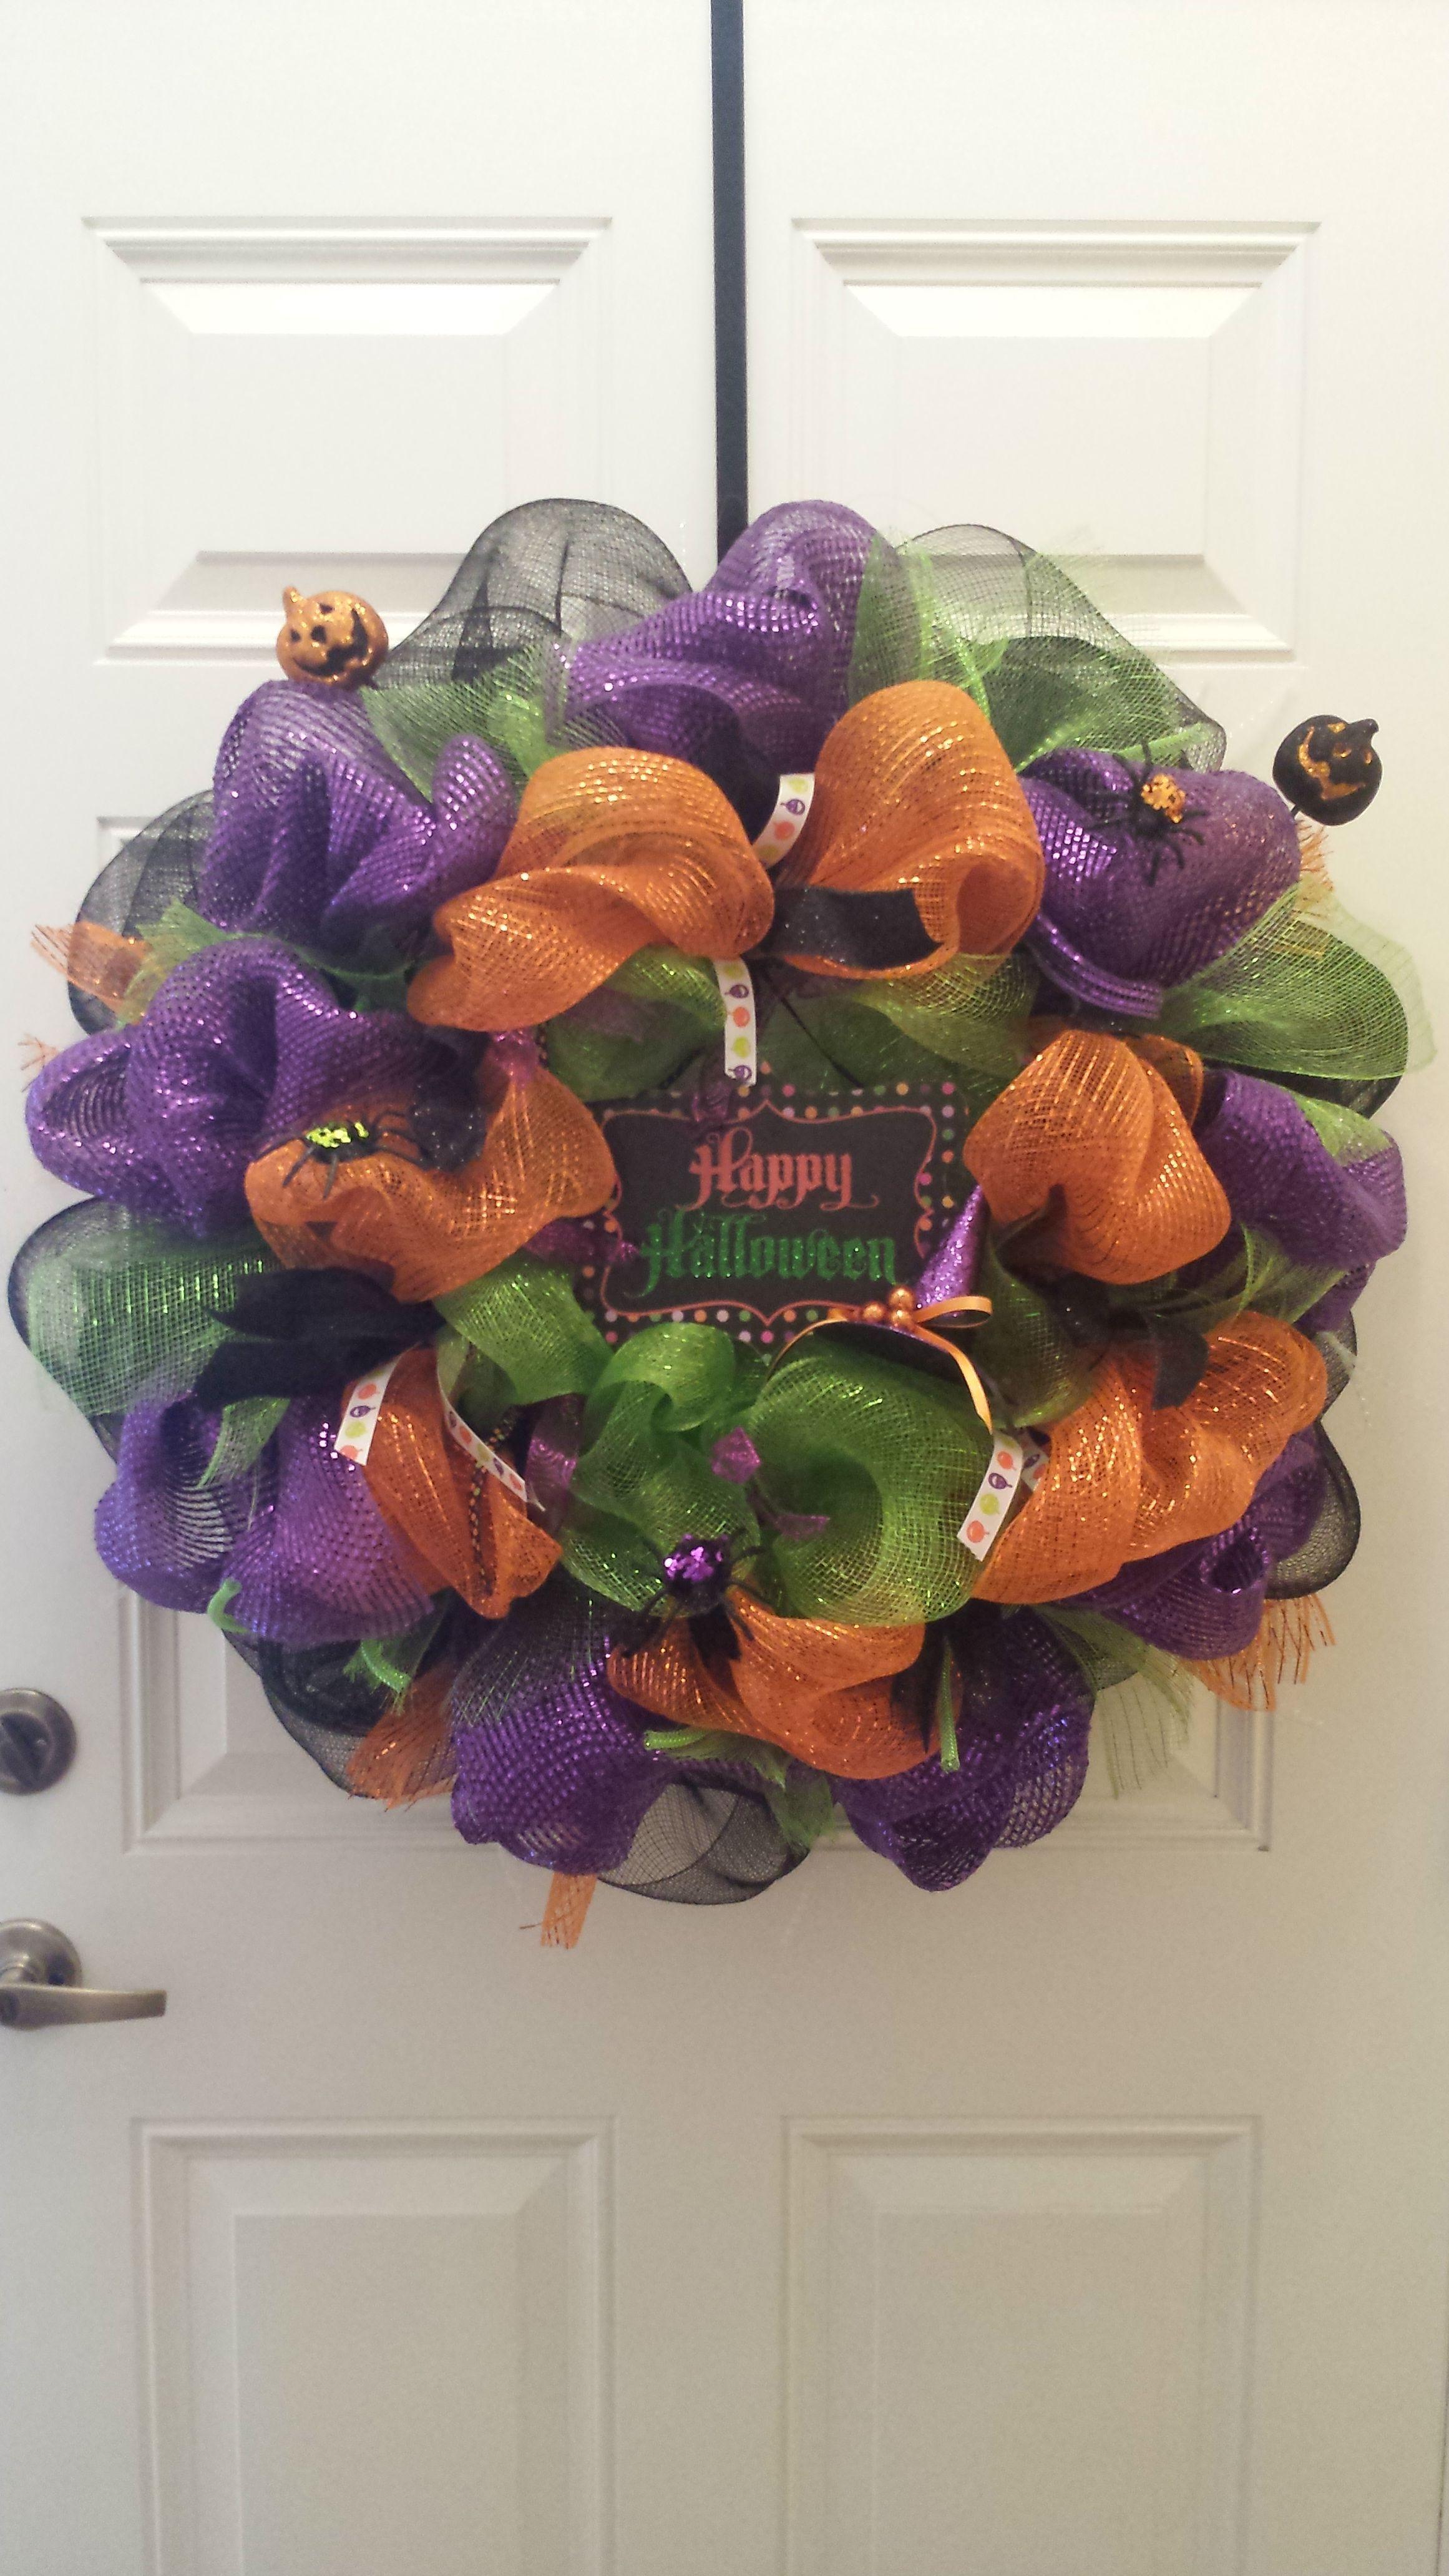 Deco Mesh Halloween Wreath #thecraftybuttercup